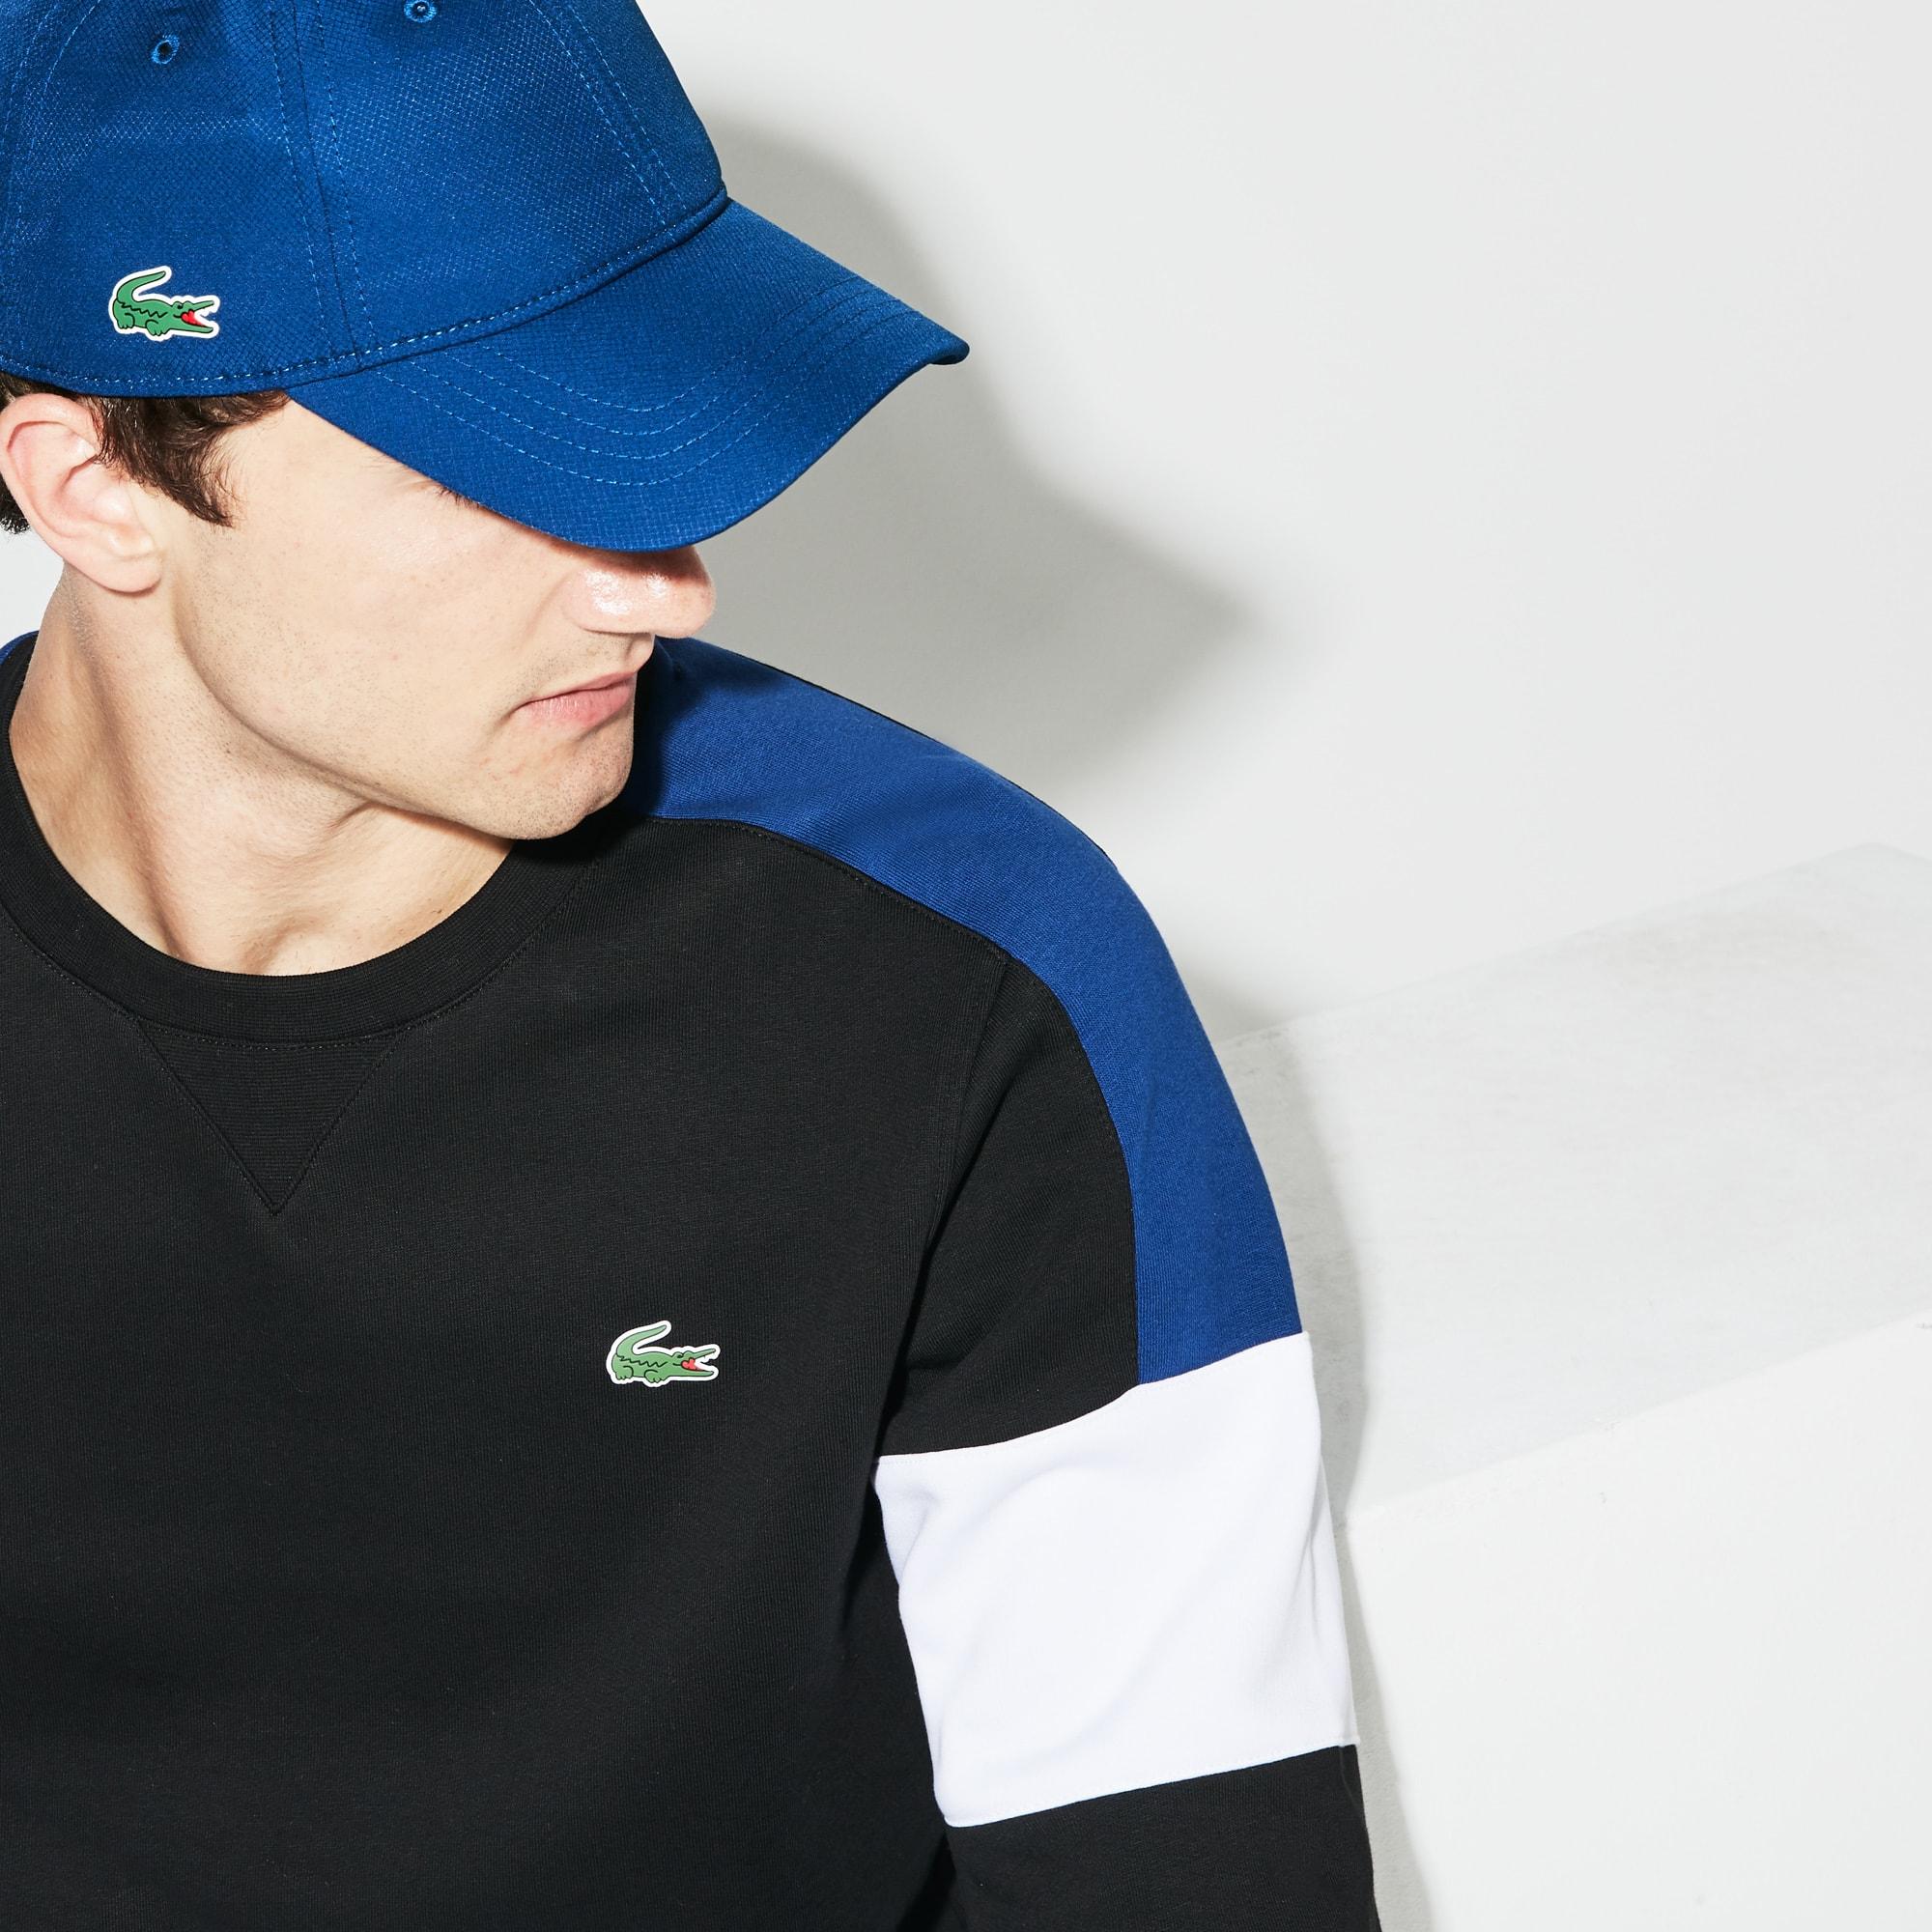 Lacoste SPORT系列男士纯色菱形编织塔夫绸帽